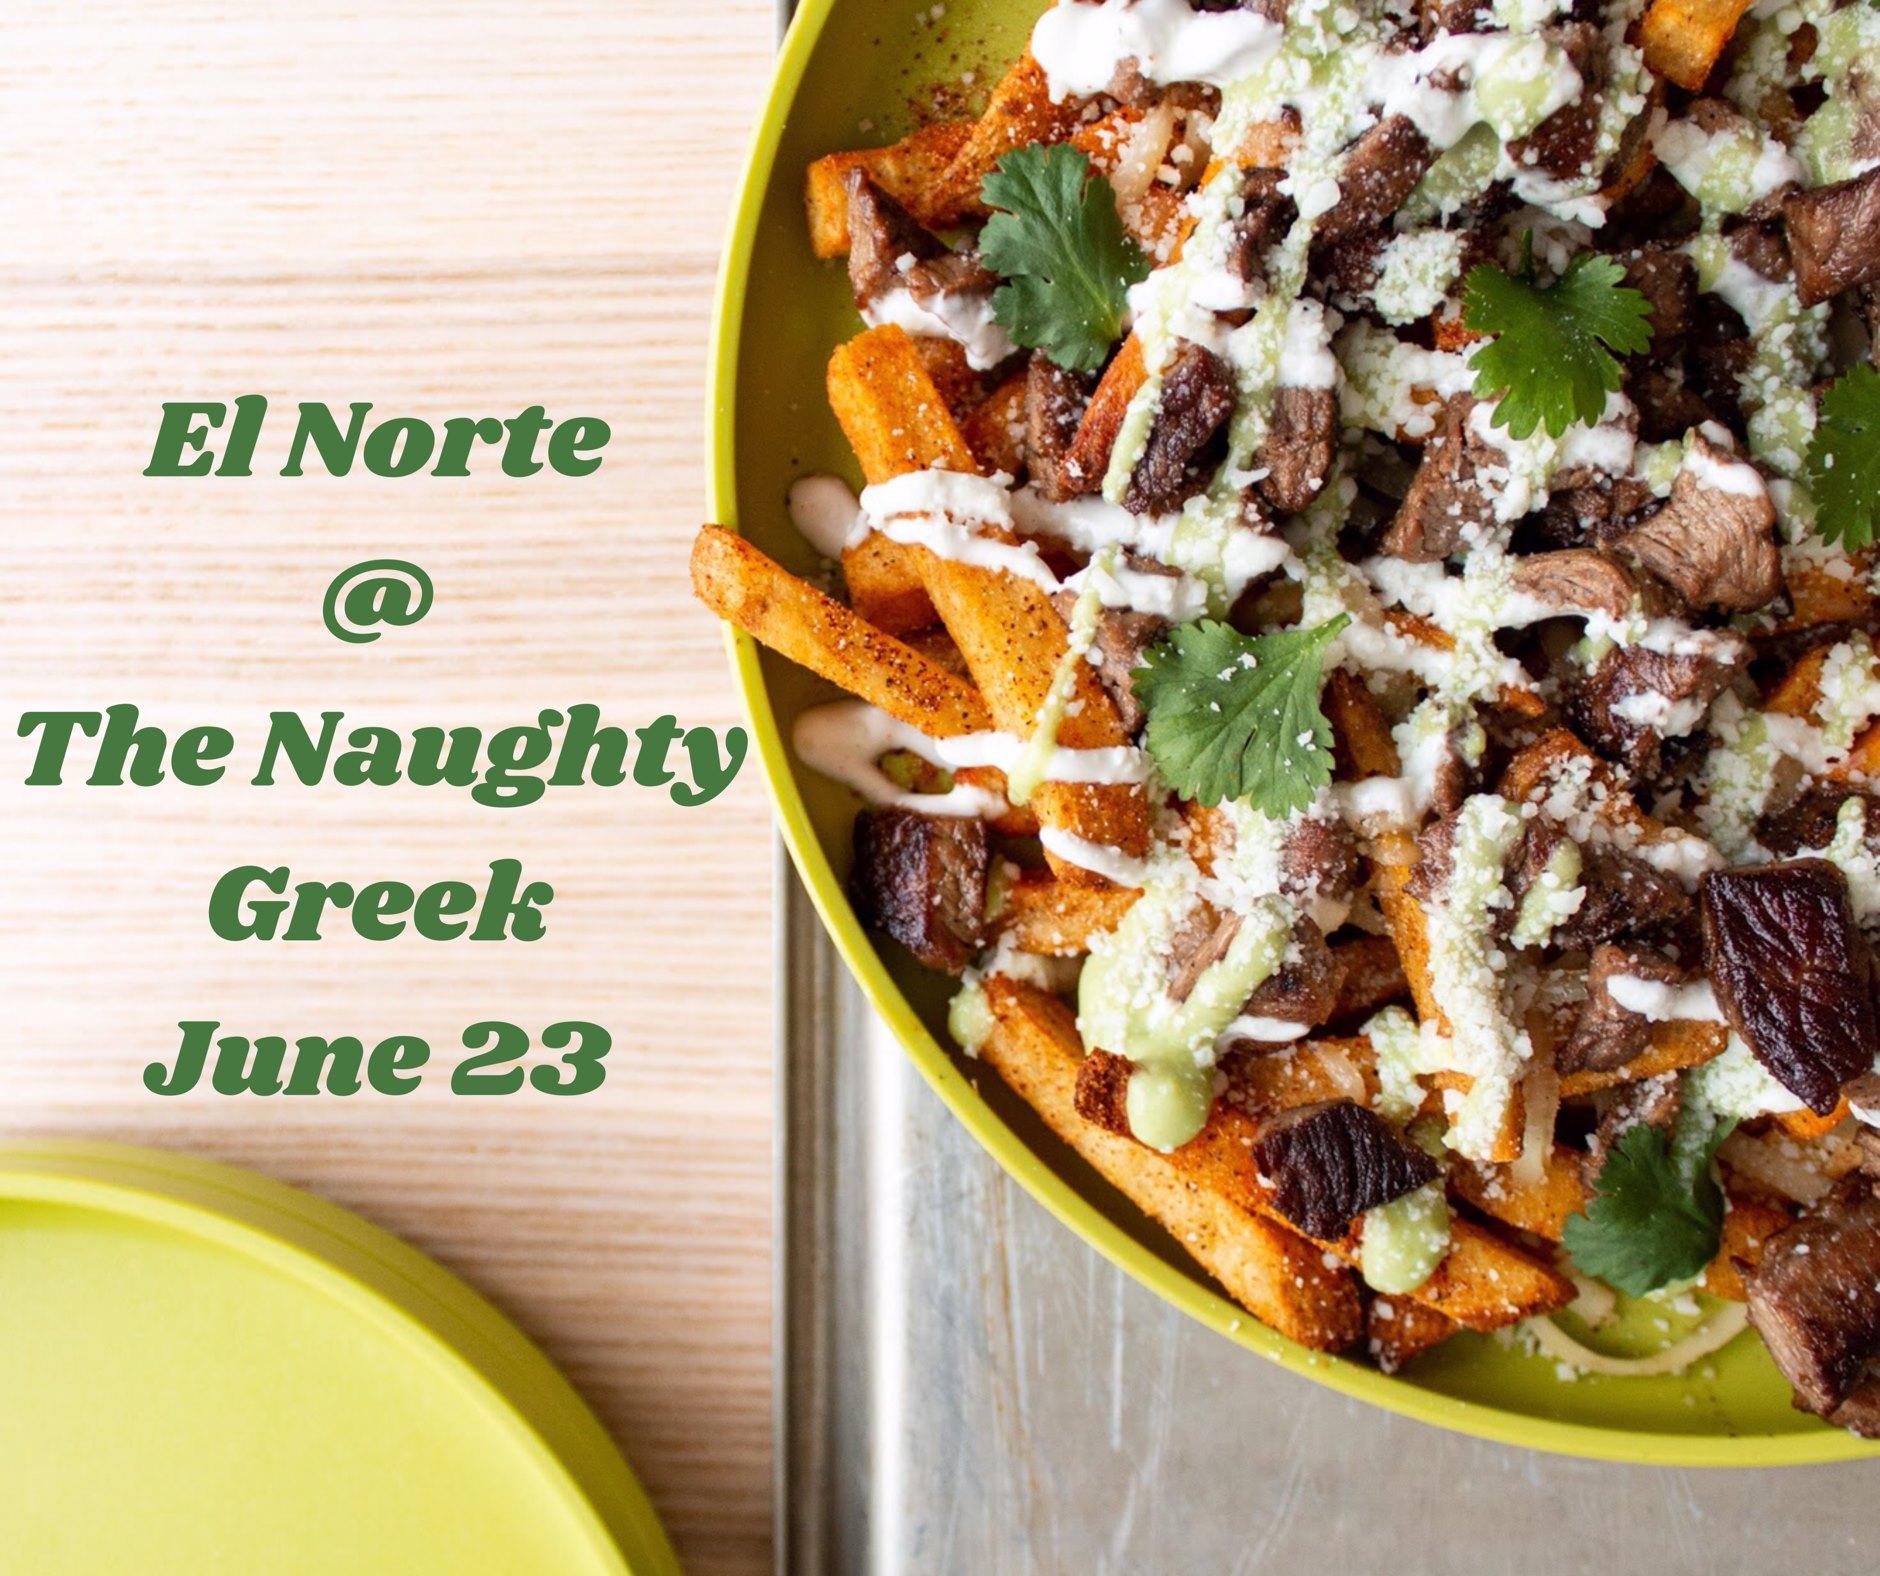 El_Norte_Kitchen_at_The_Naughty_Greek_Pop_Up.jpg